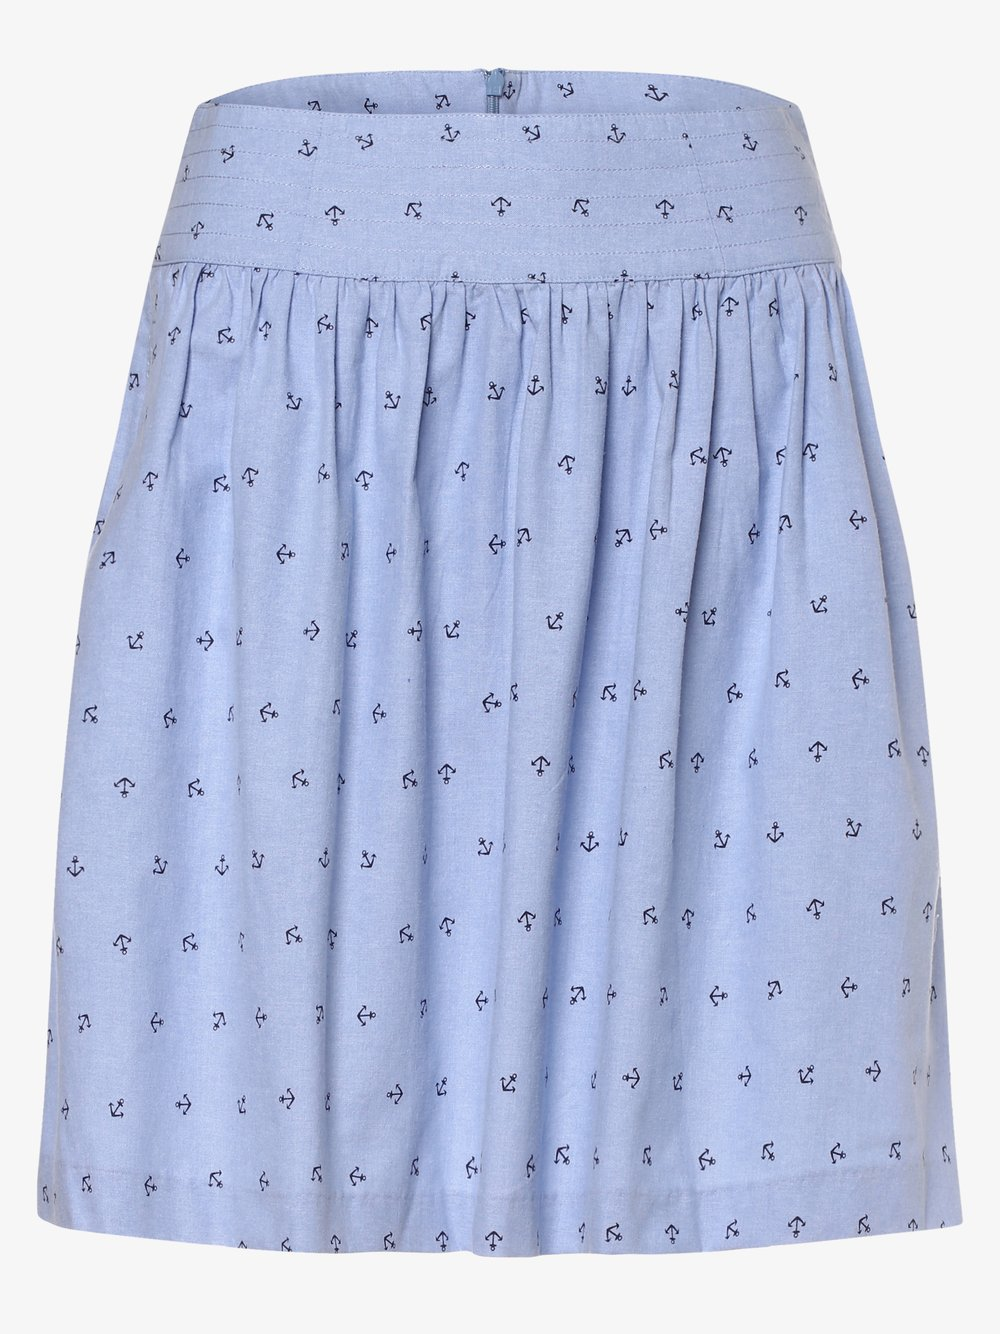 Marie Lund - Spódnica damska, niebieski